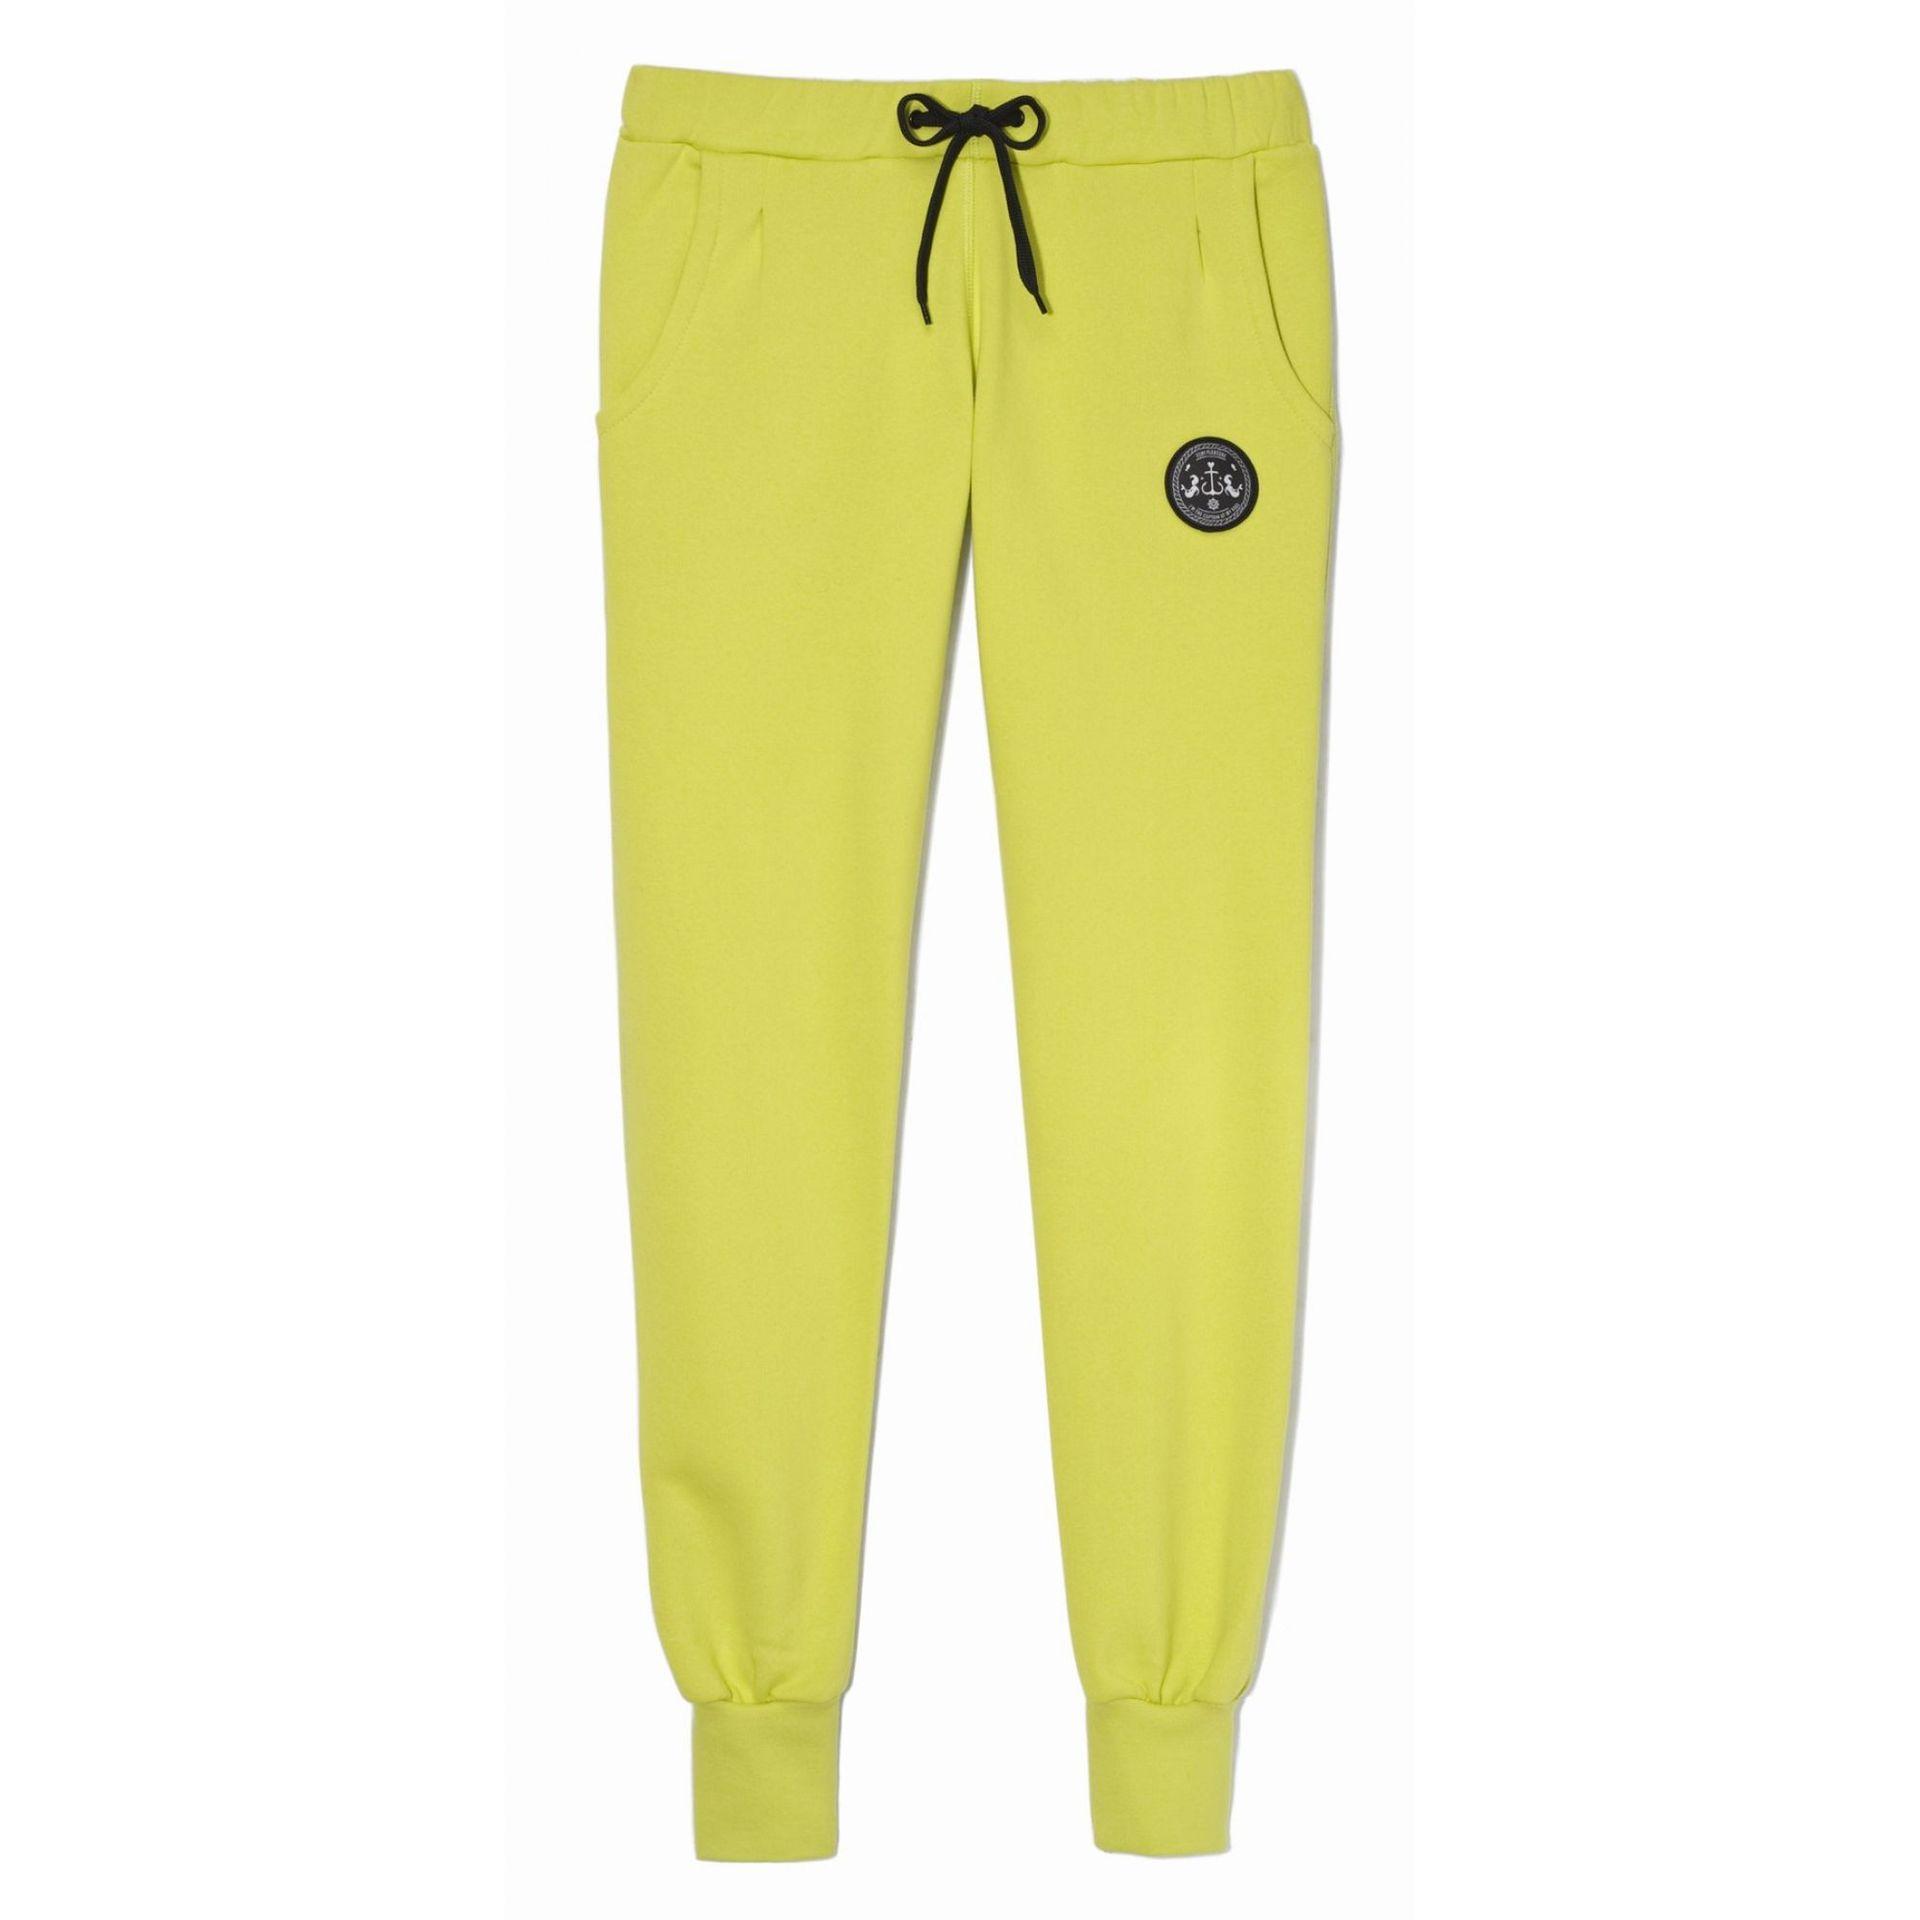 Spodnie Femi Pleasure Rhodos limonkowe